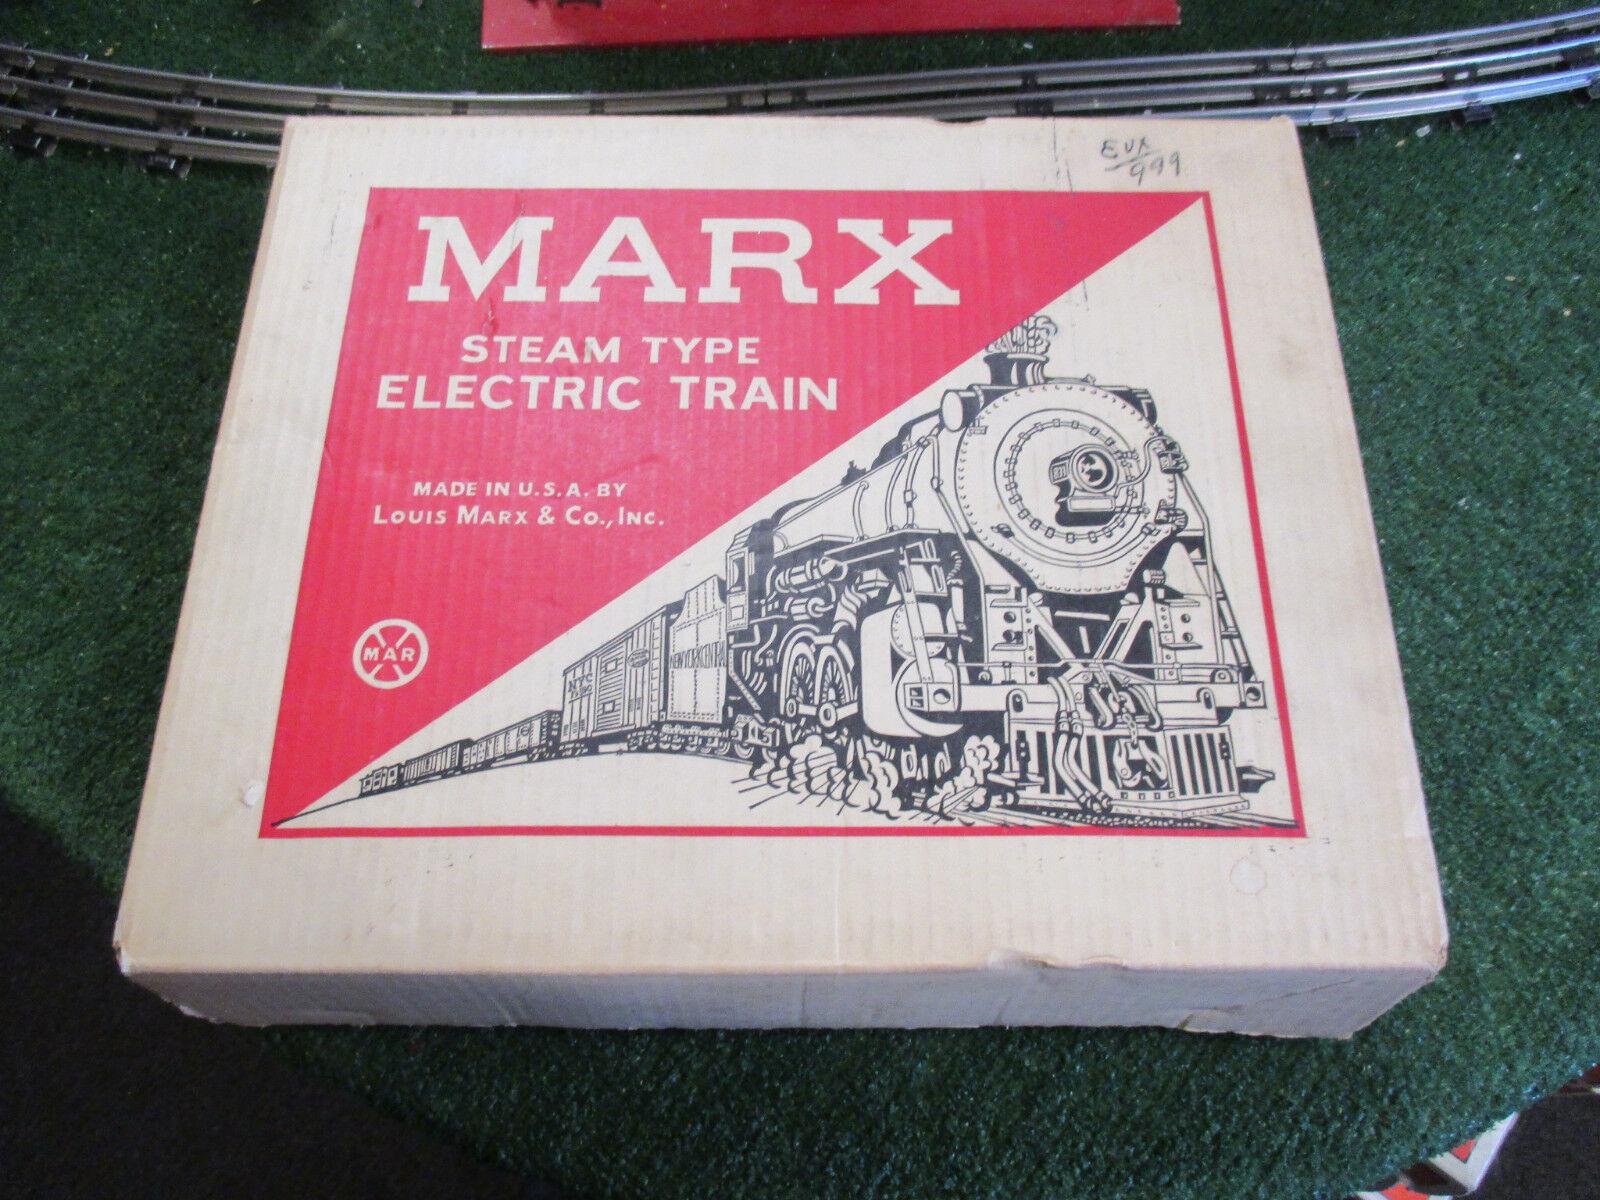 MARX 4040 4040 4040 STEAM TYPE ELECTRIC TRAIN SET WITH ORIGINAL BOX EXCELLENT CONDITION e17801